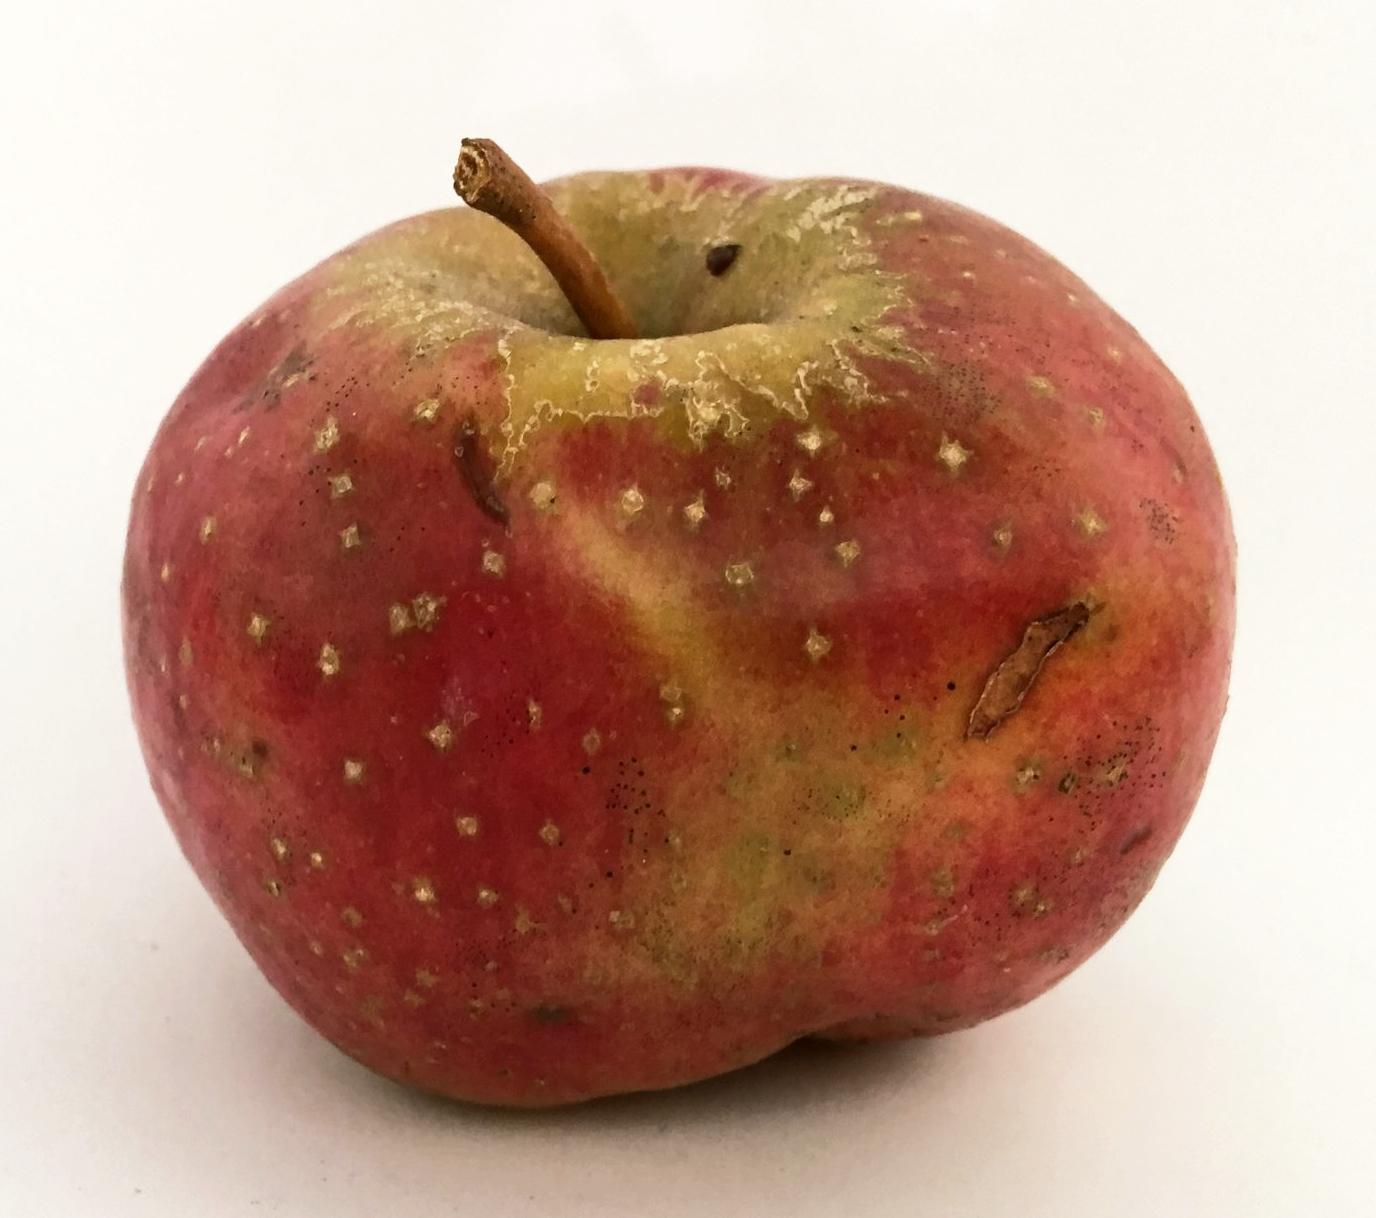 Swiss Limbertwig Apple